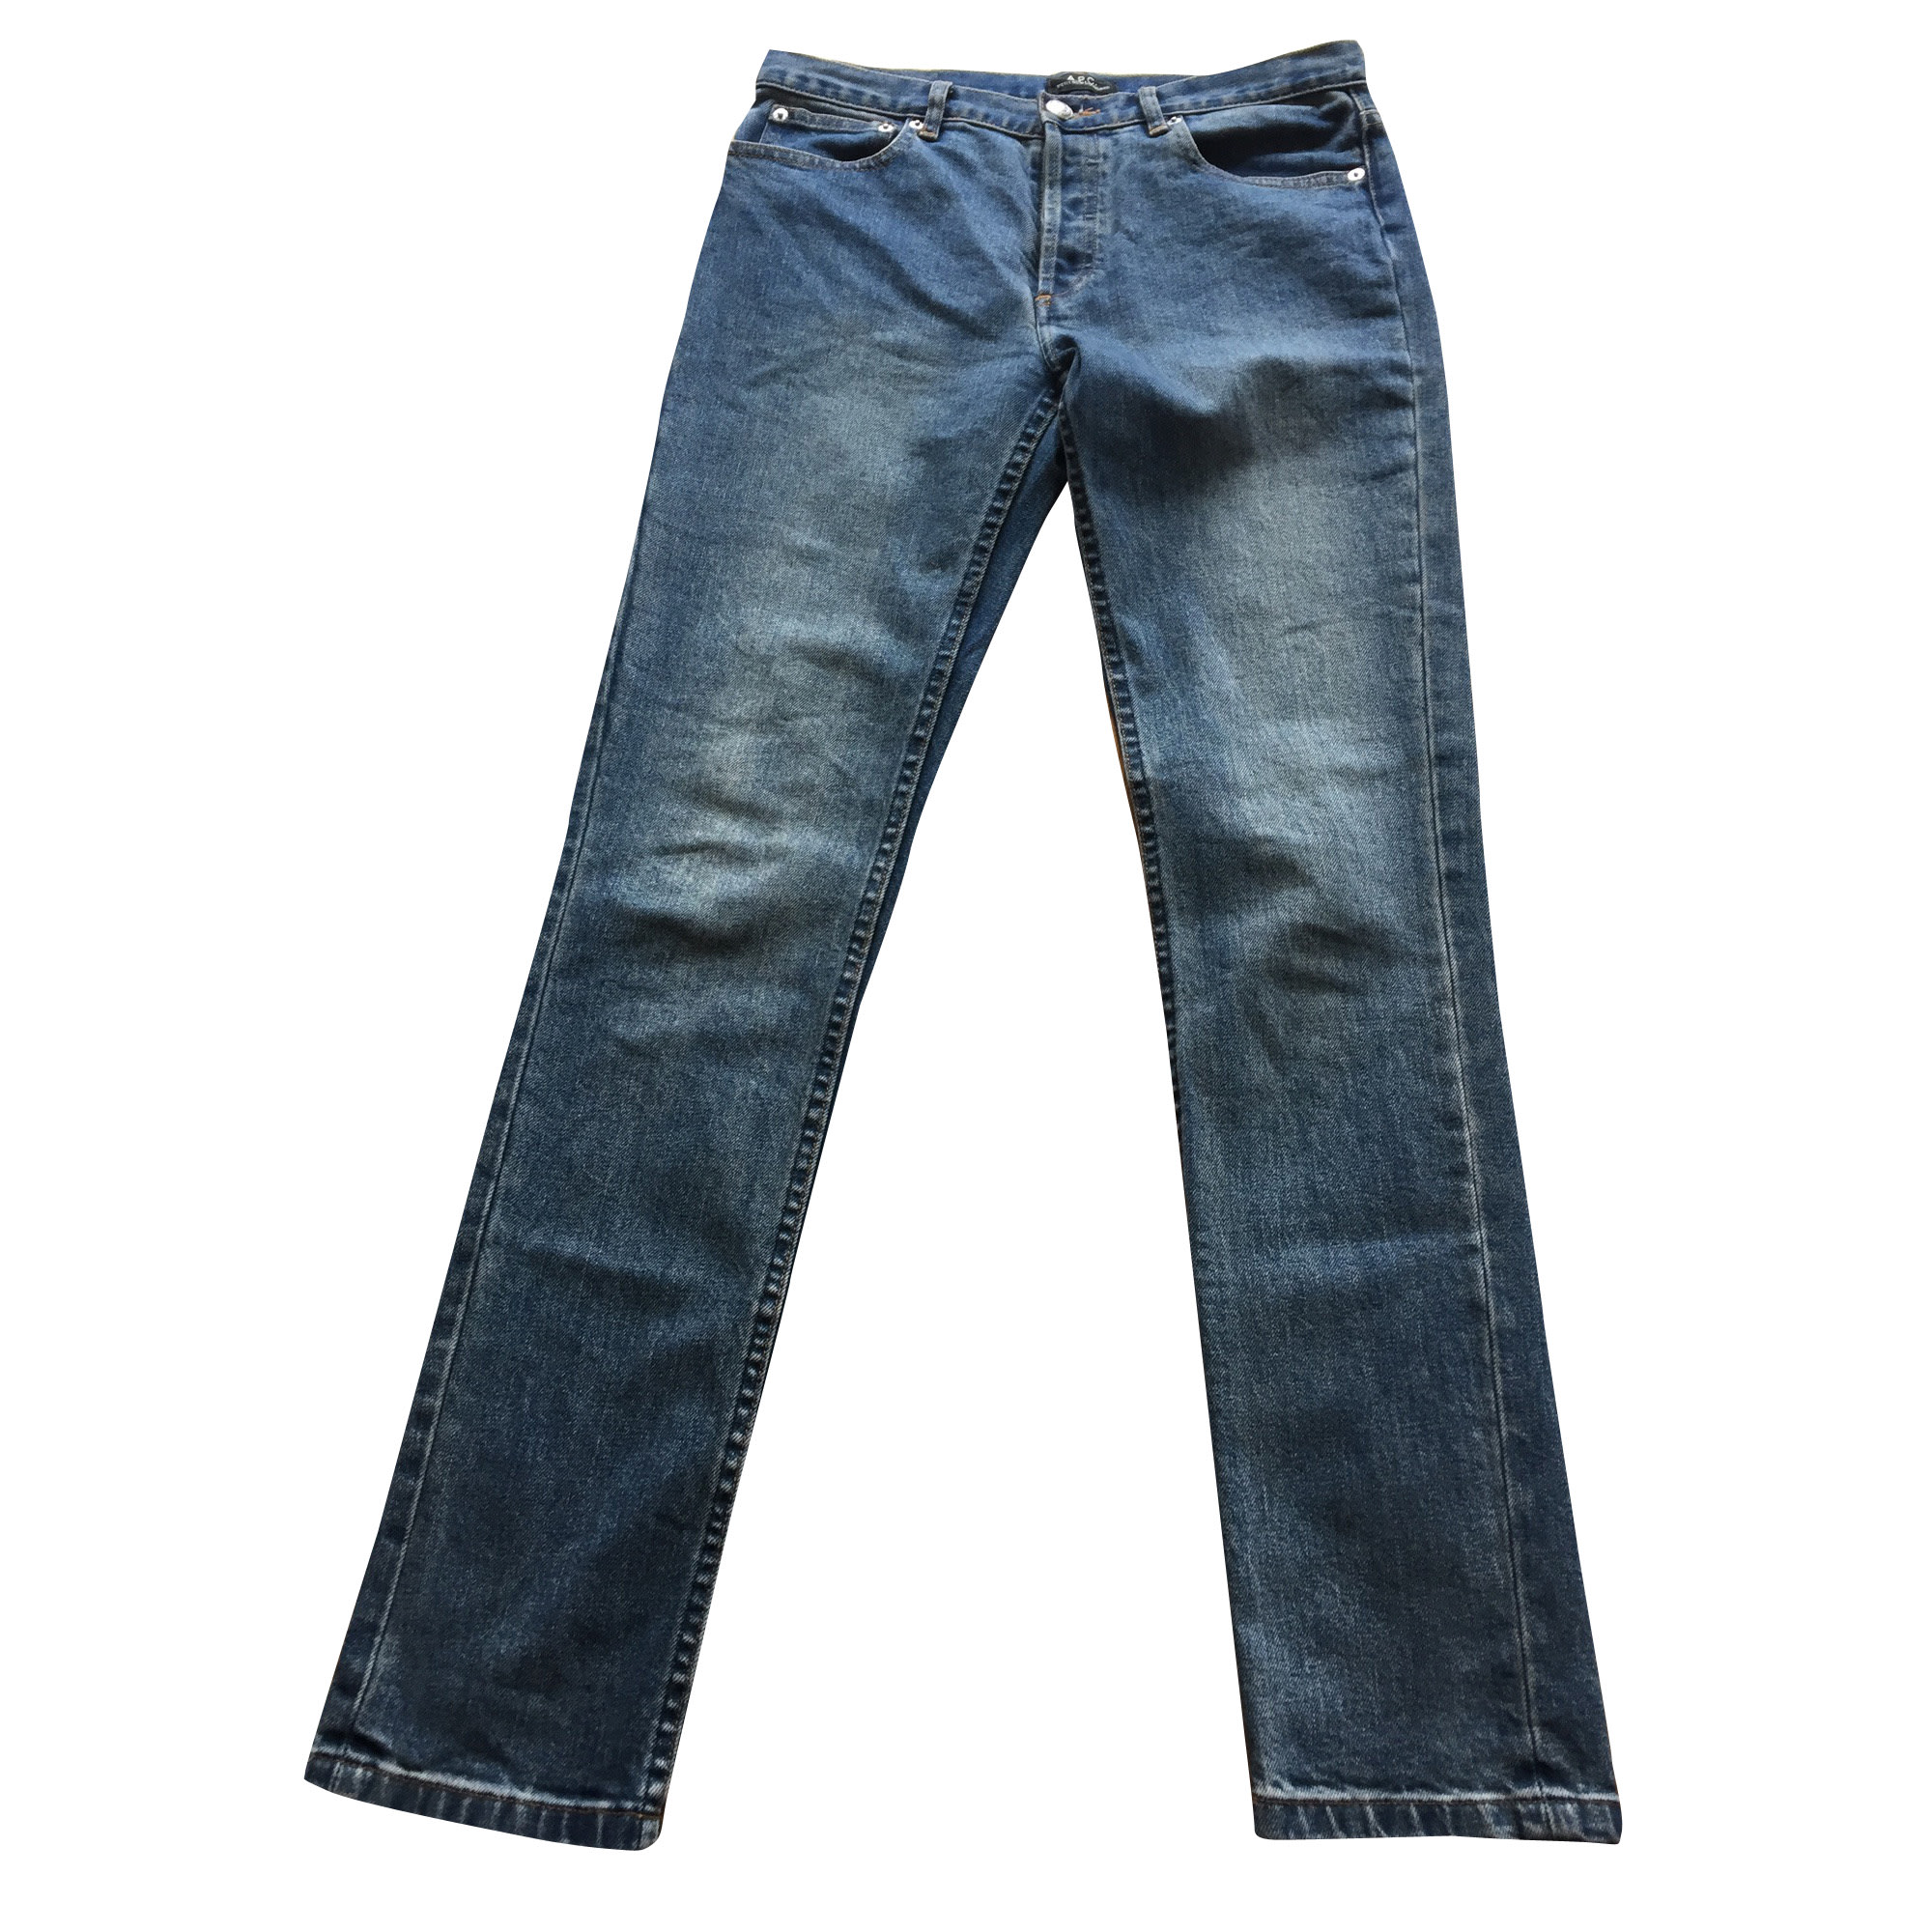 Jeans slim A.P.C. Blu, blu navy, turchese